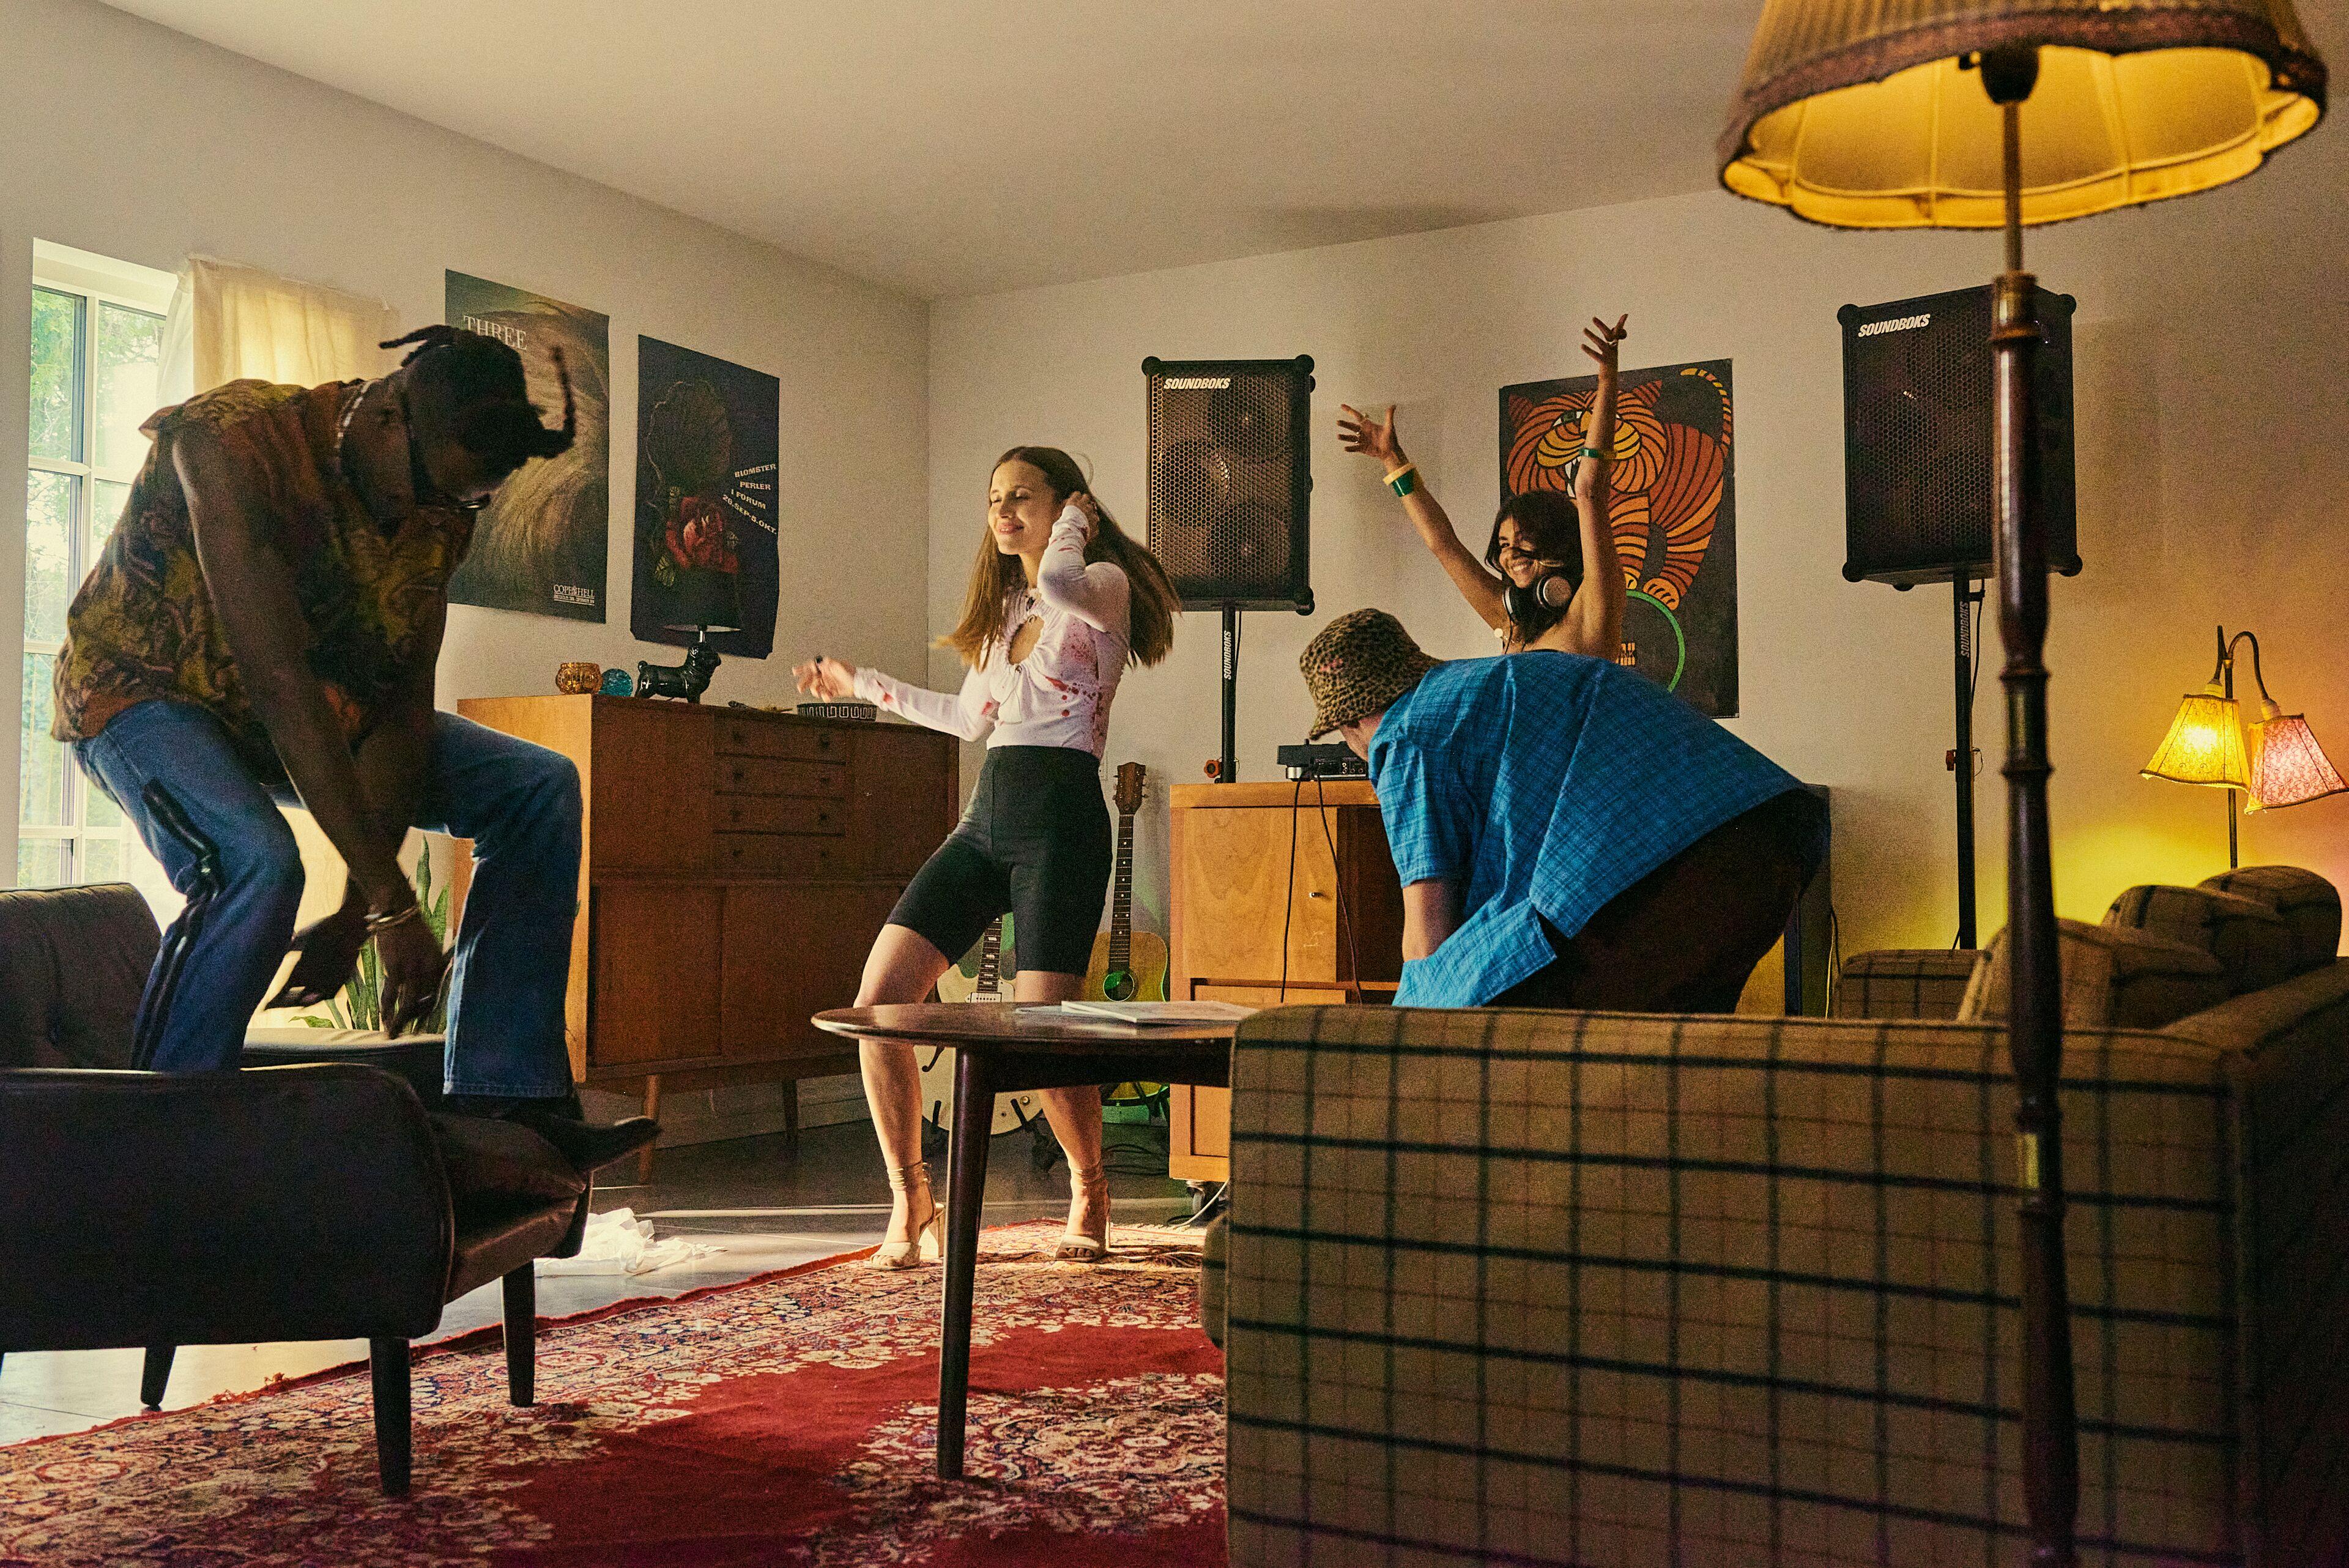 SOUNDBOKS in an indoor party environment